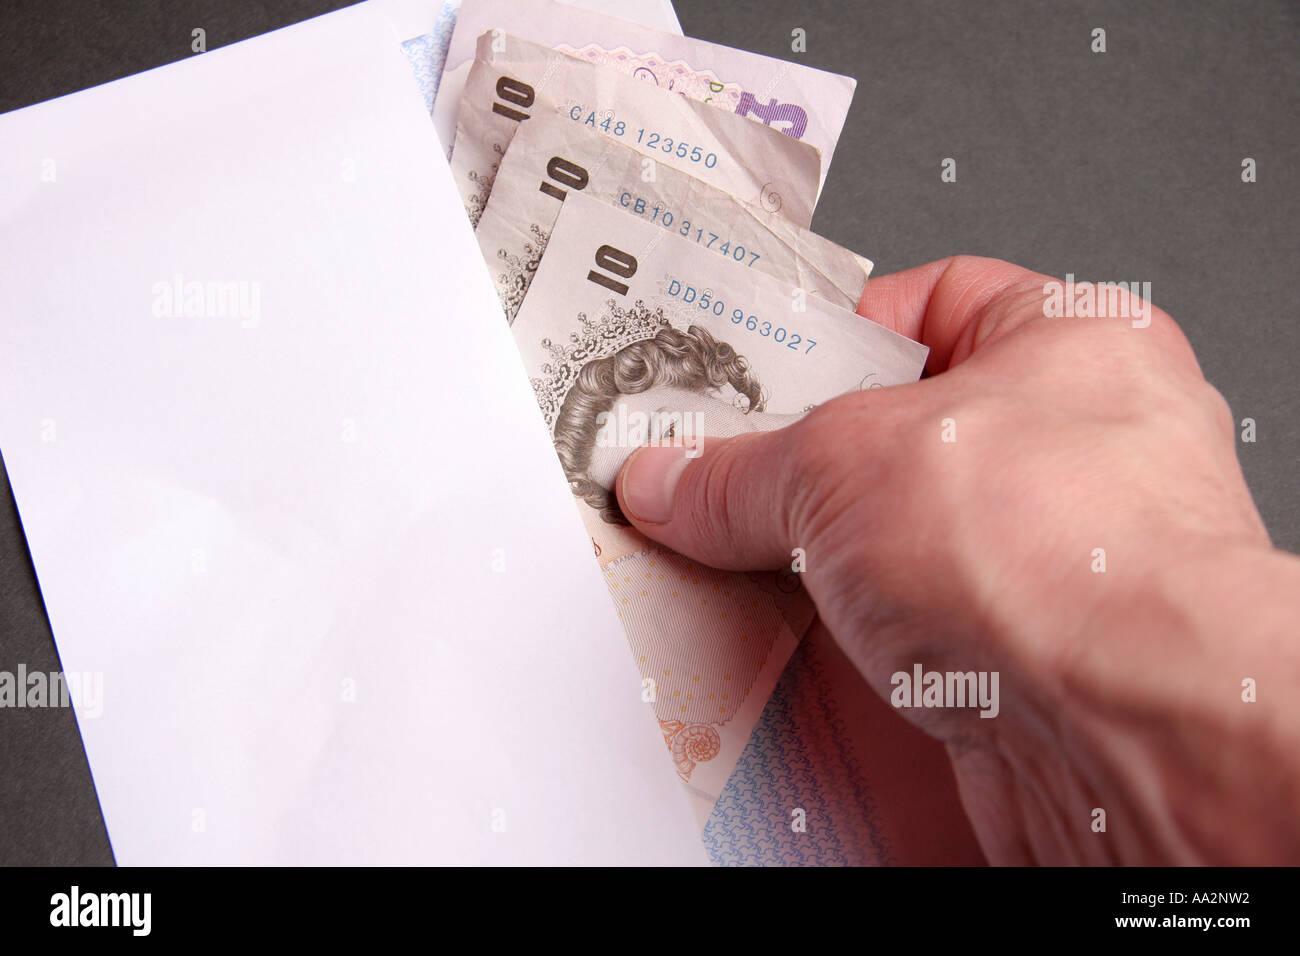 putting cash in envelope - Stock Image